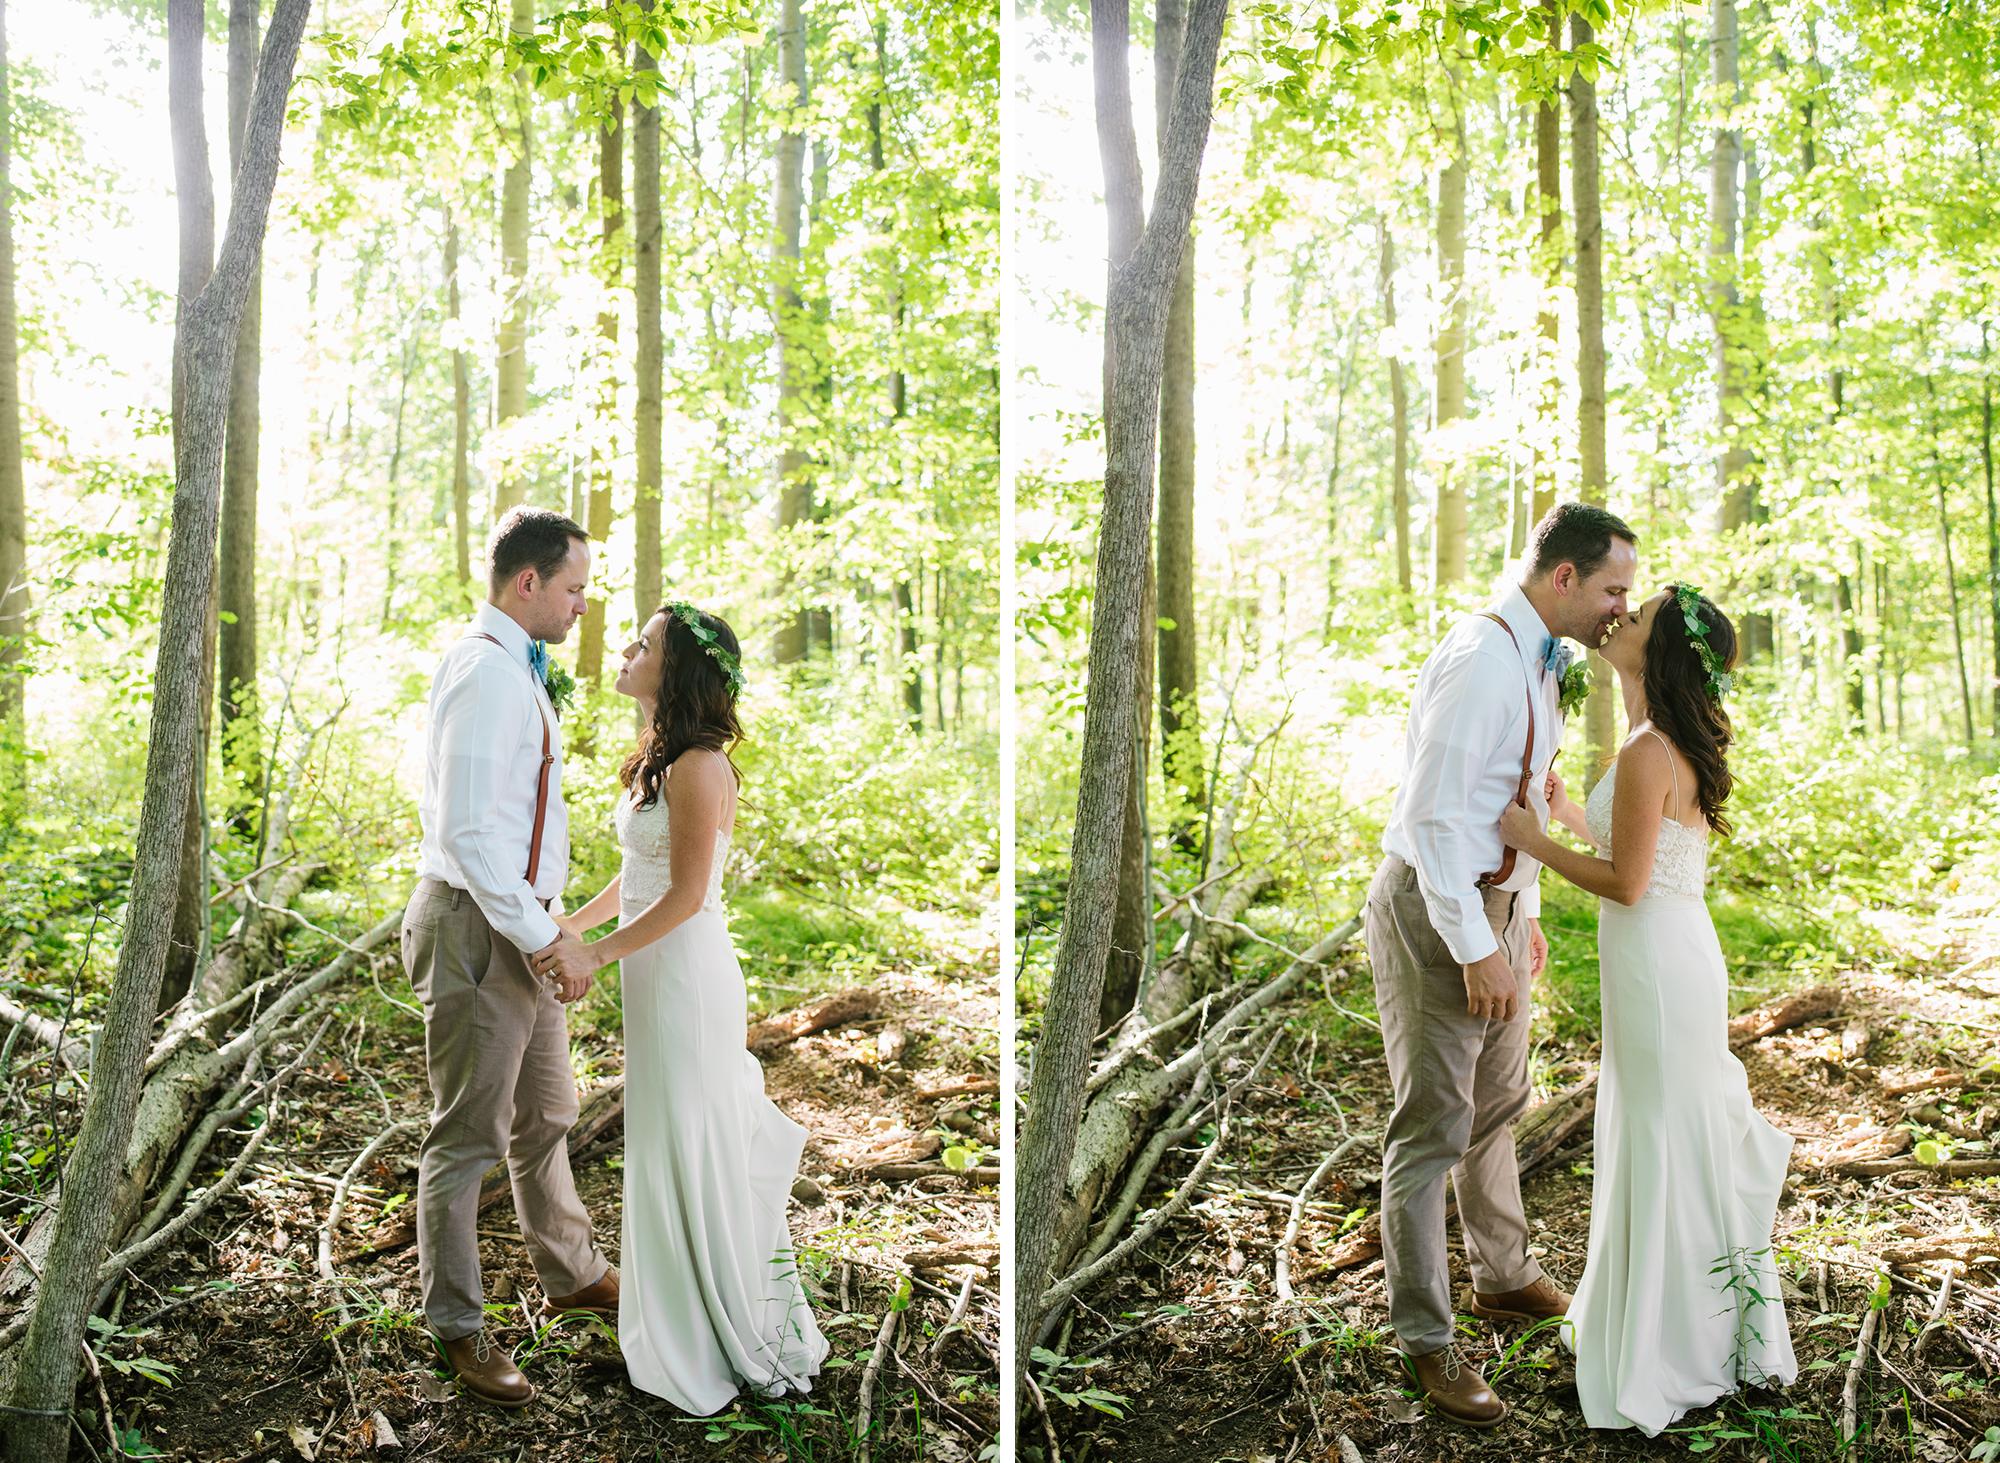 bride-groom-portraits-woods-michigan-wedding-photographer-sydney-marie.png